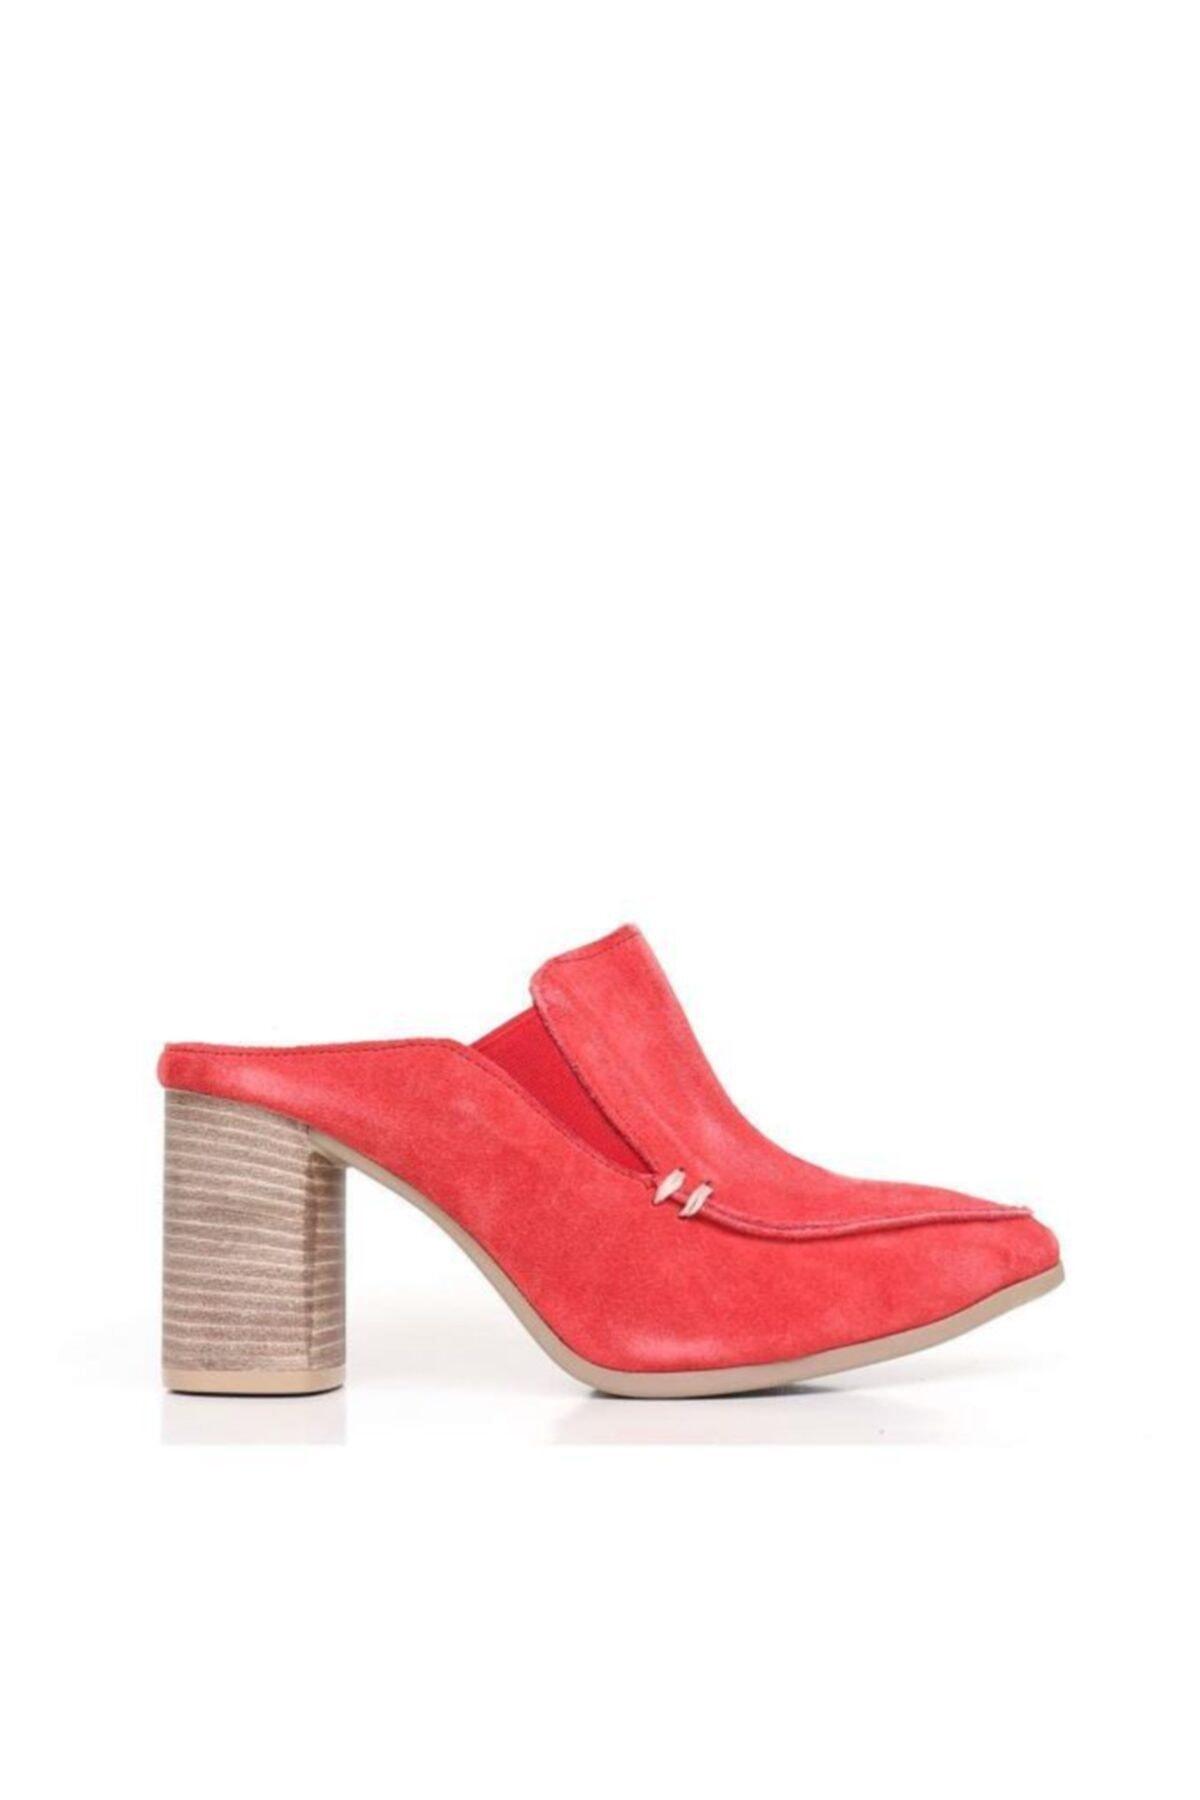 BUENO Shoes Lastik Detay Hakiki Deri Topuklu Kadın Terlik 9n6702 1